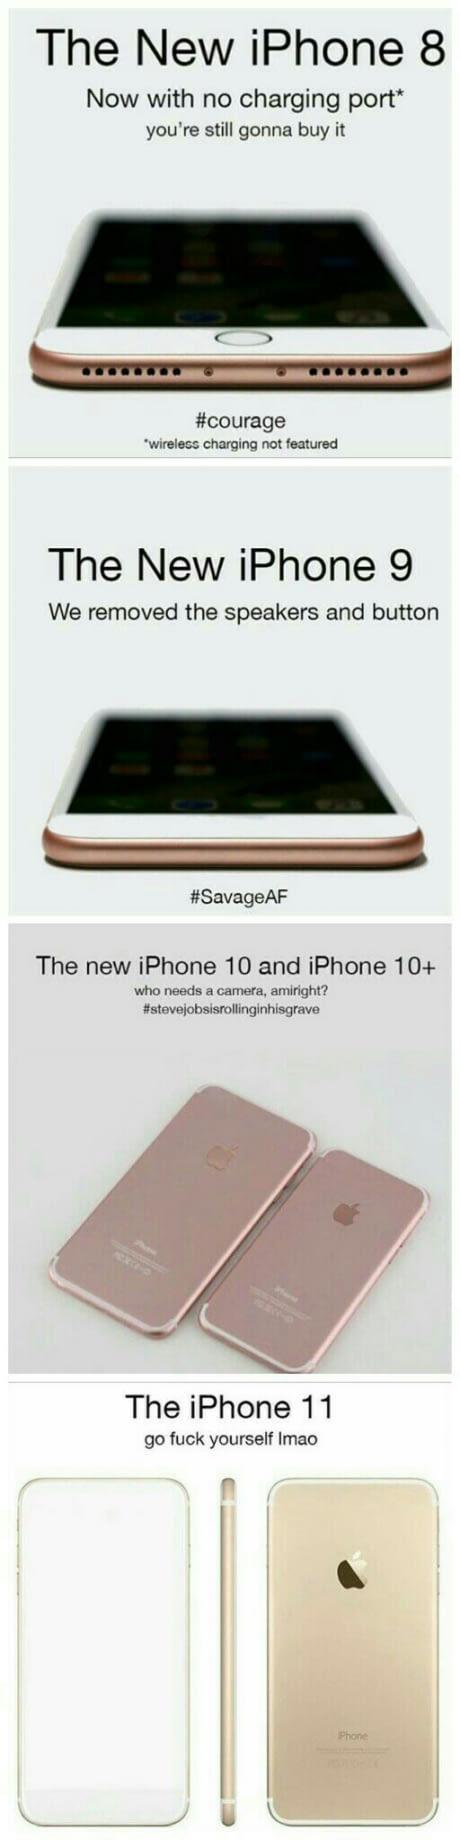 iPhone 8 | iPhone 9 | iPhone 10+ | iPhone 11